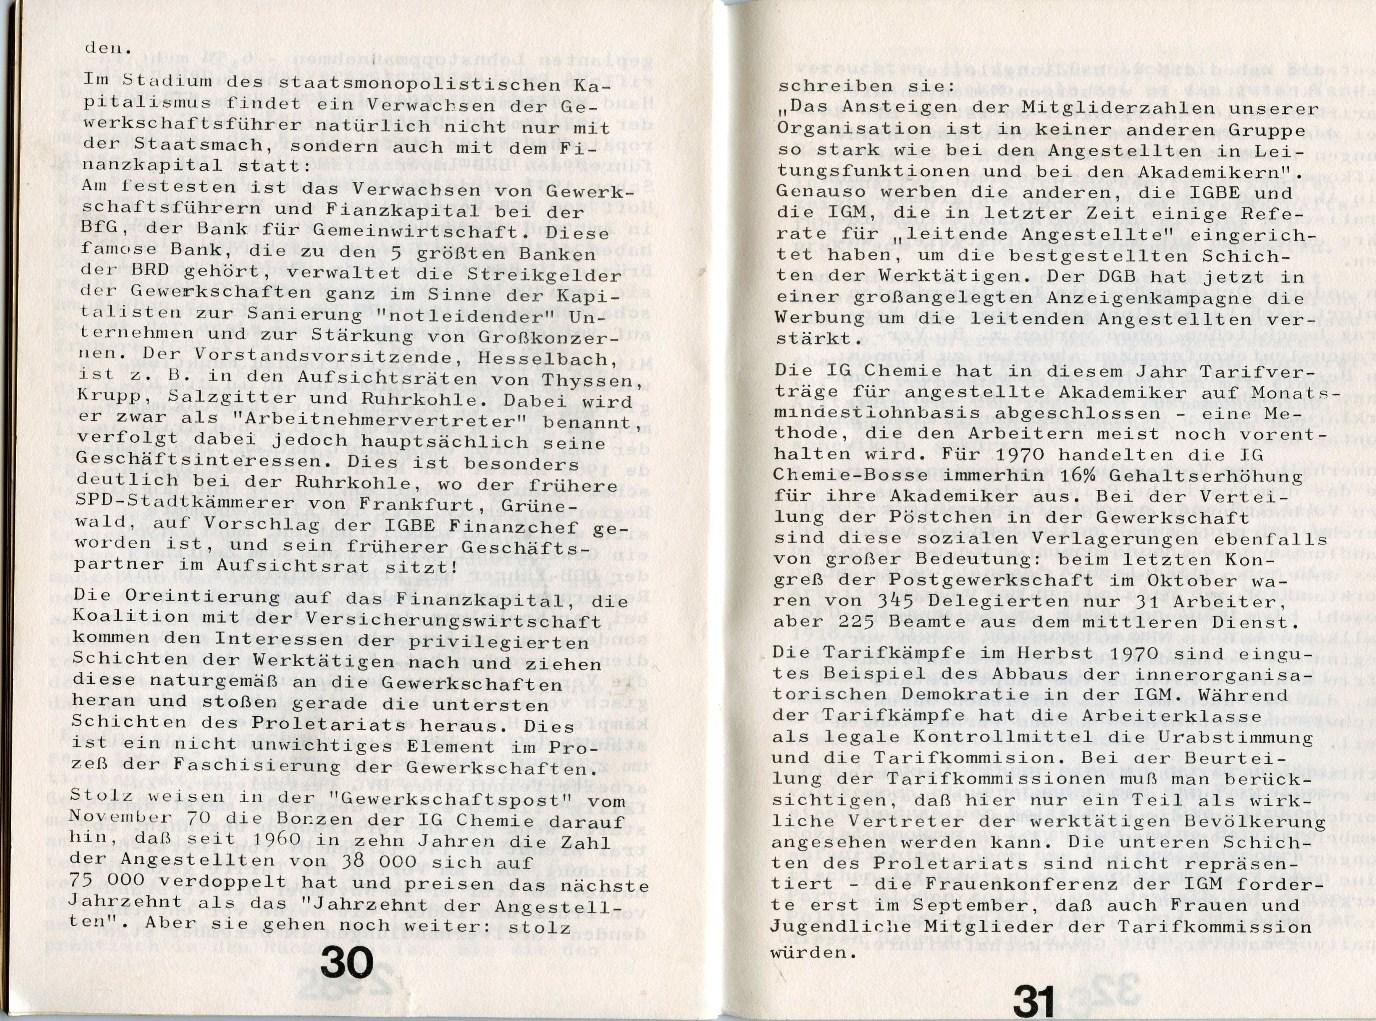 KJVD_Sozialdemokratie_Sozialfaschismus_1971_17